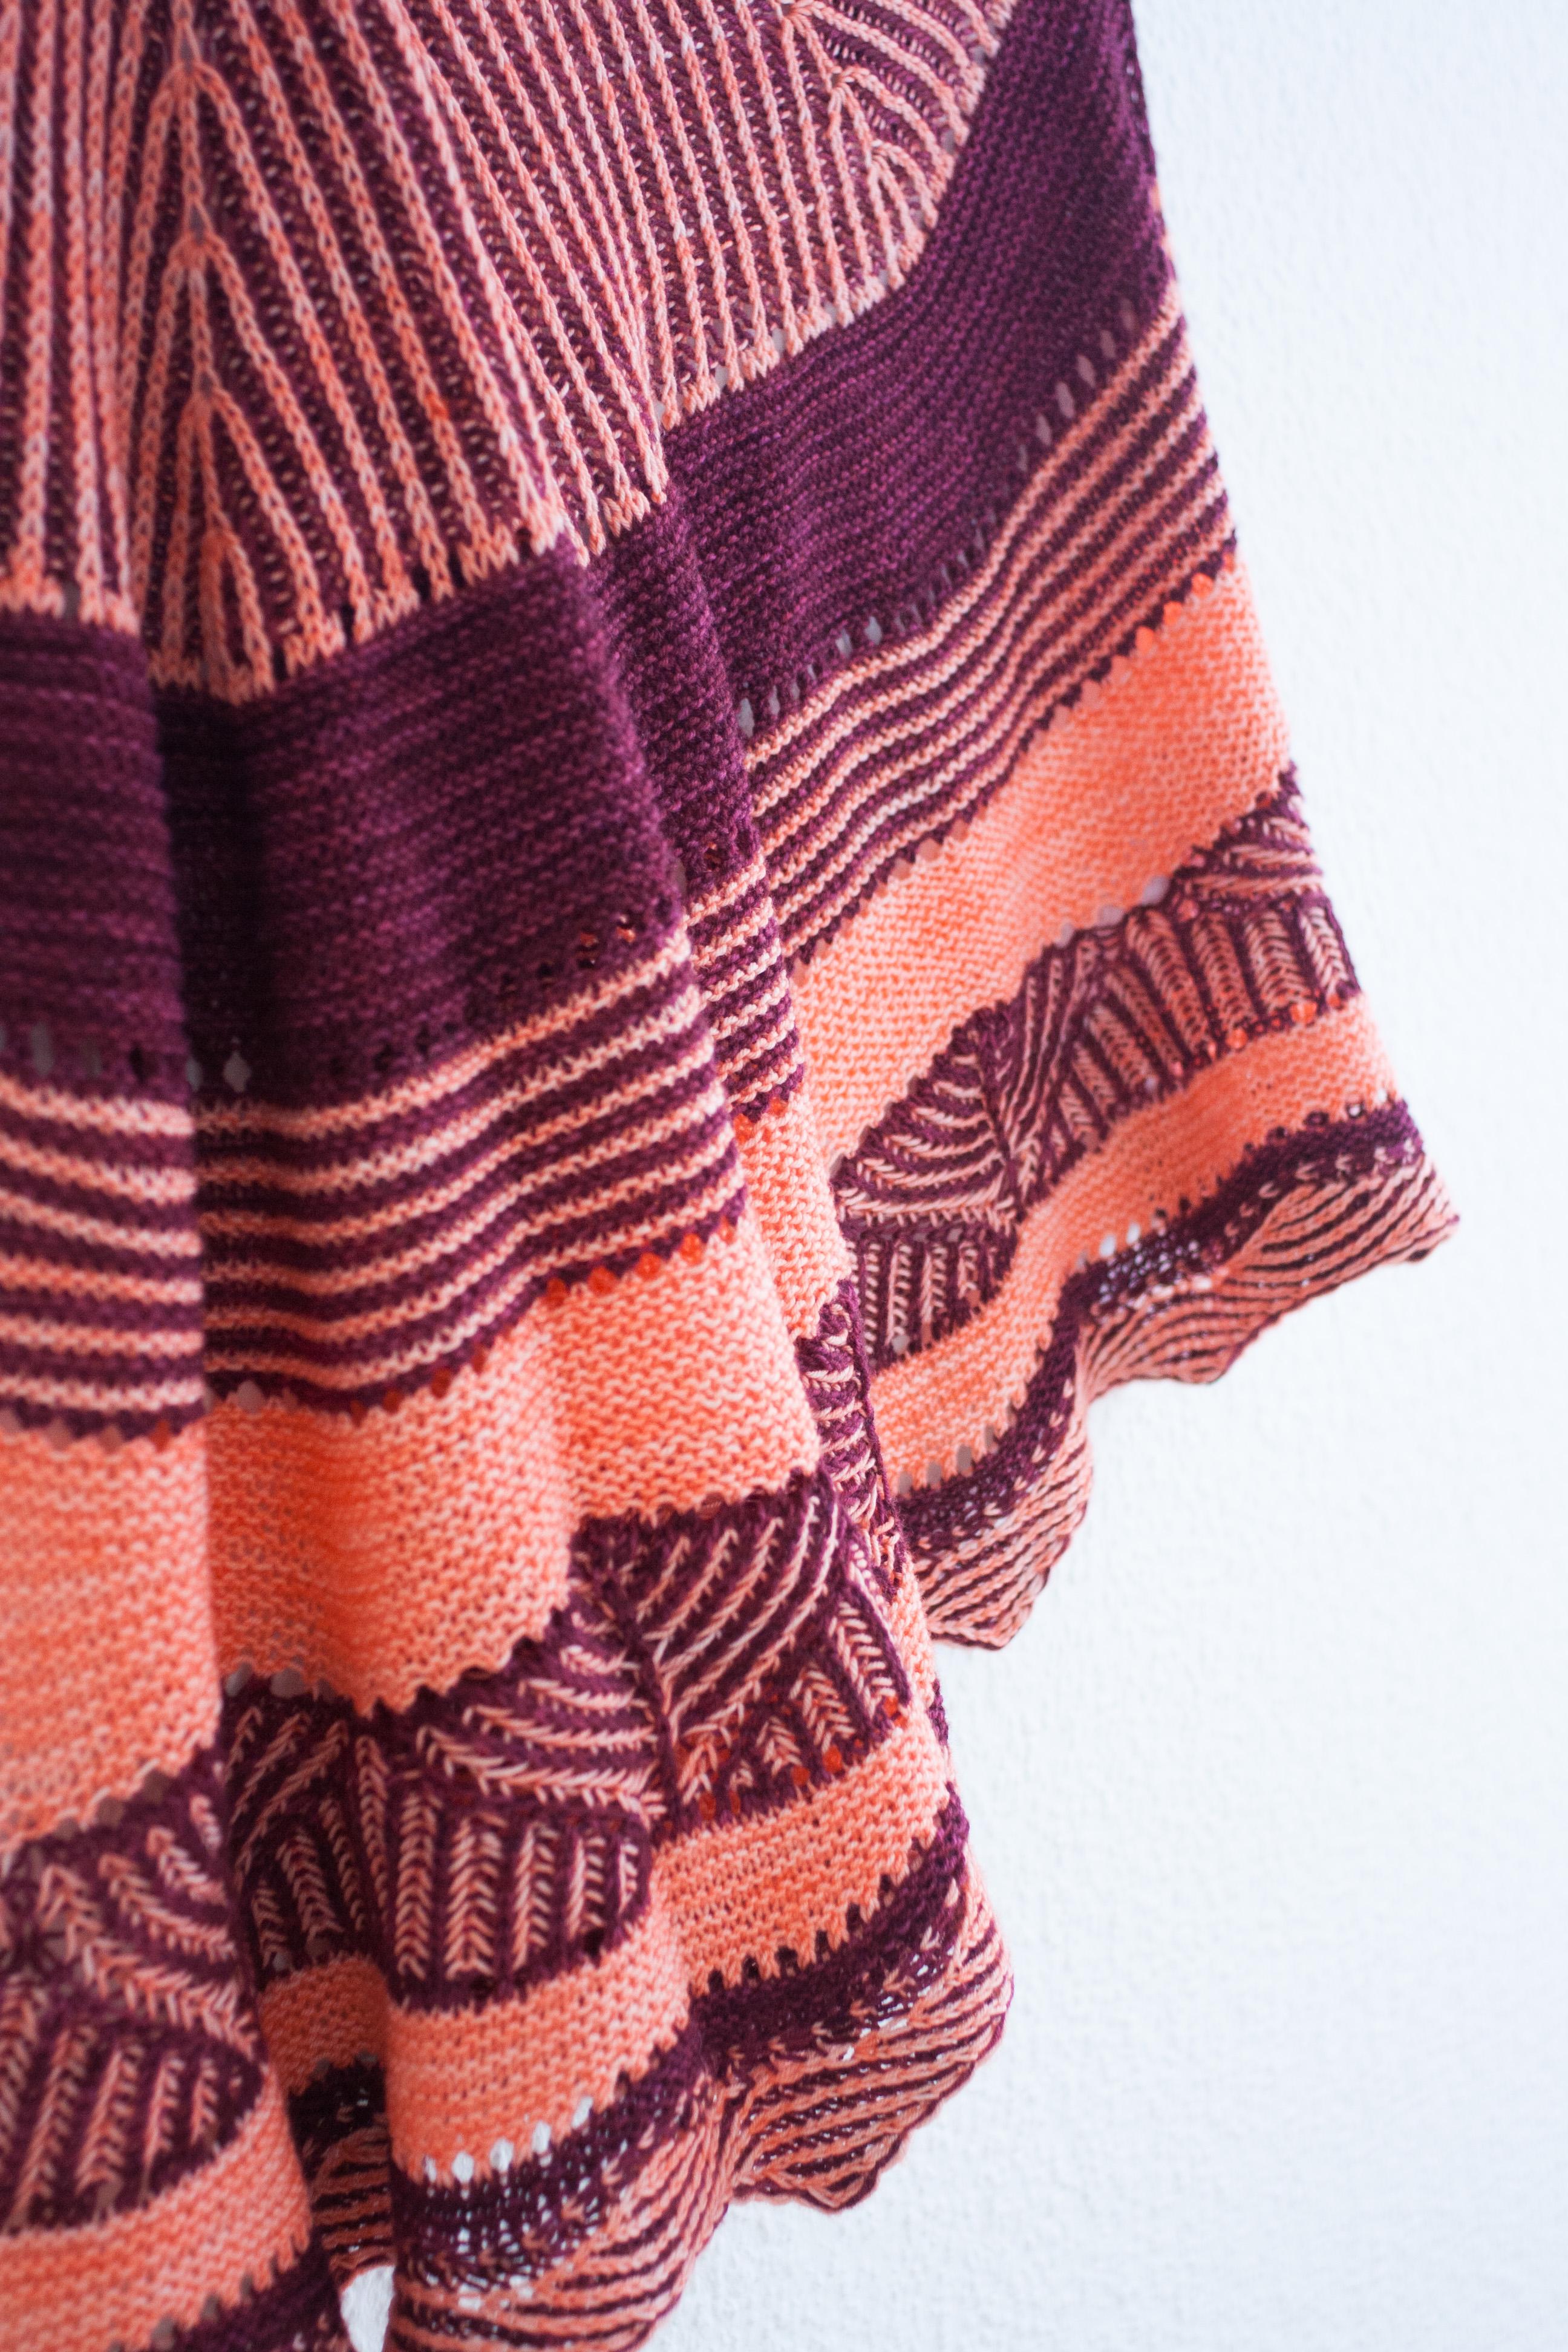 New pattern} Brioche for Teatime Shawl | Dans le nid du tisserin